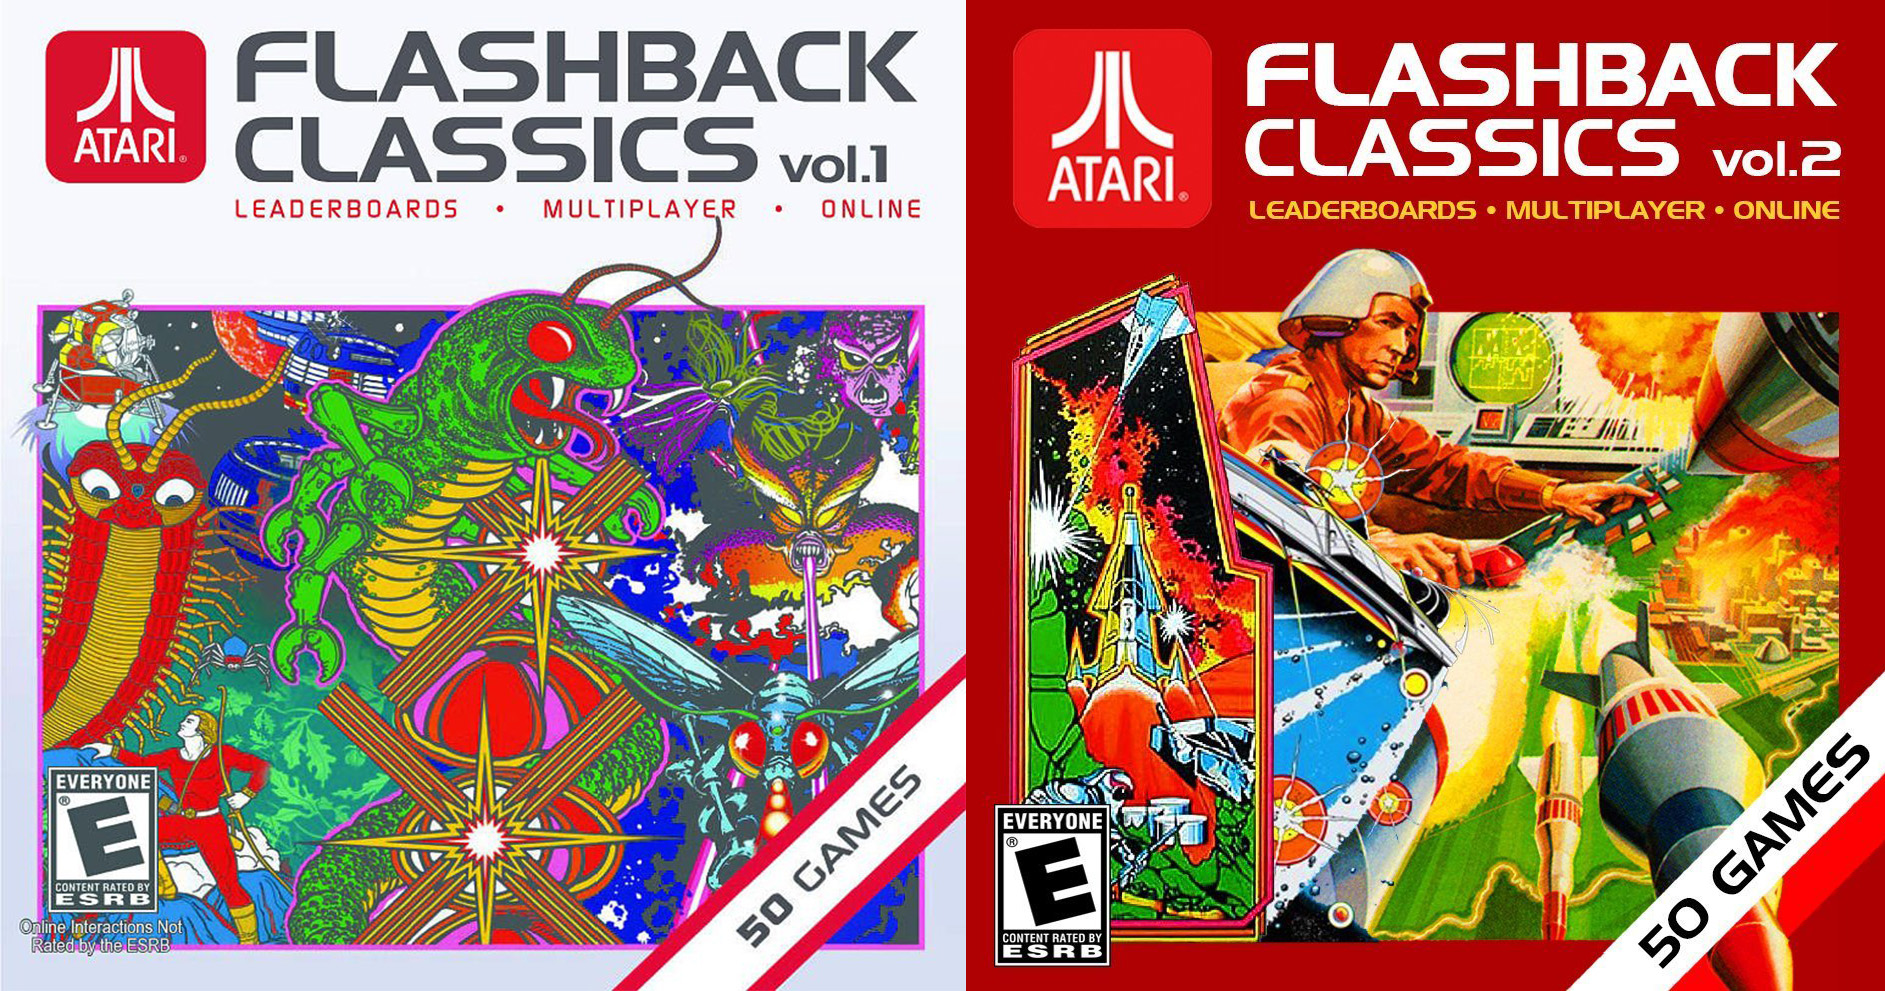 Atari Flashback Classics - Vol 1 & 2